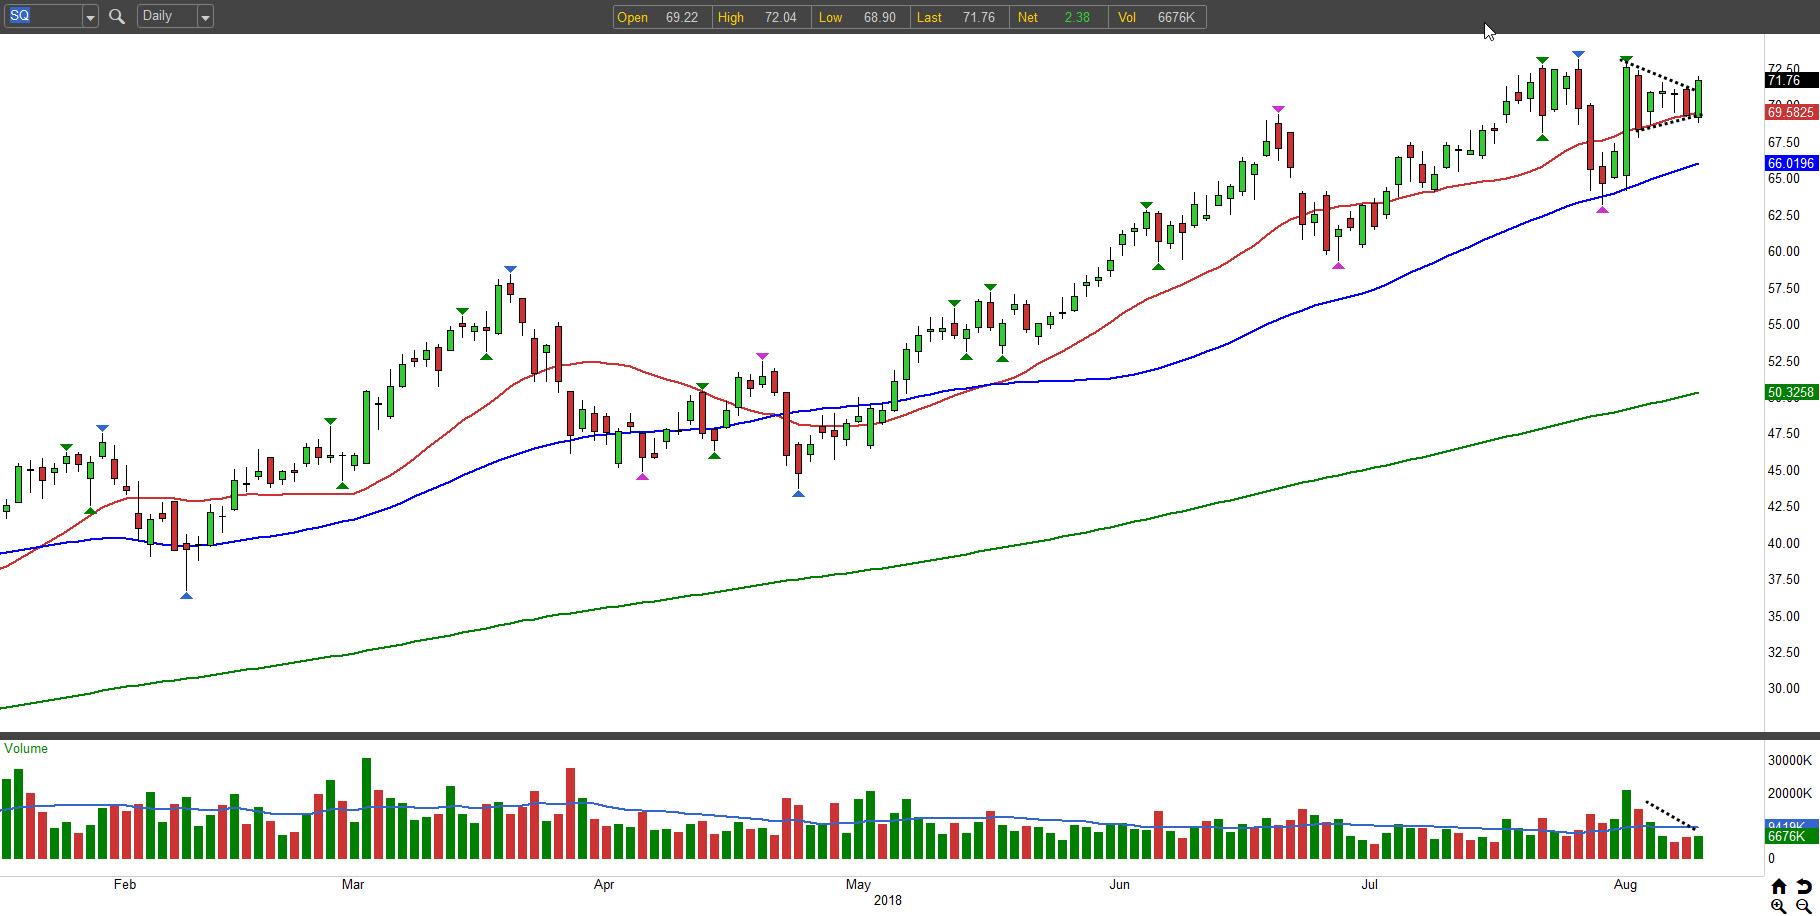 SQ stock